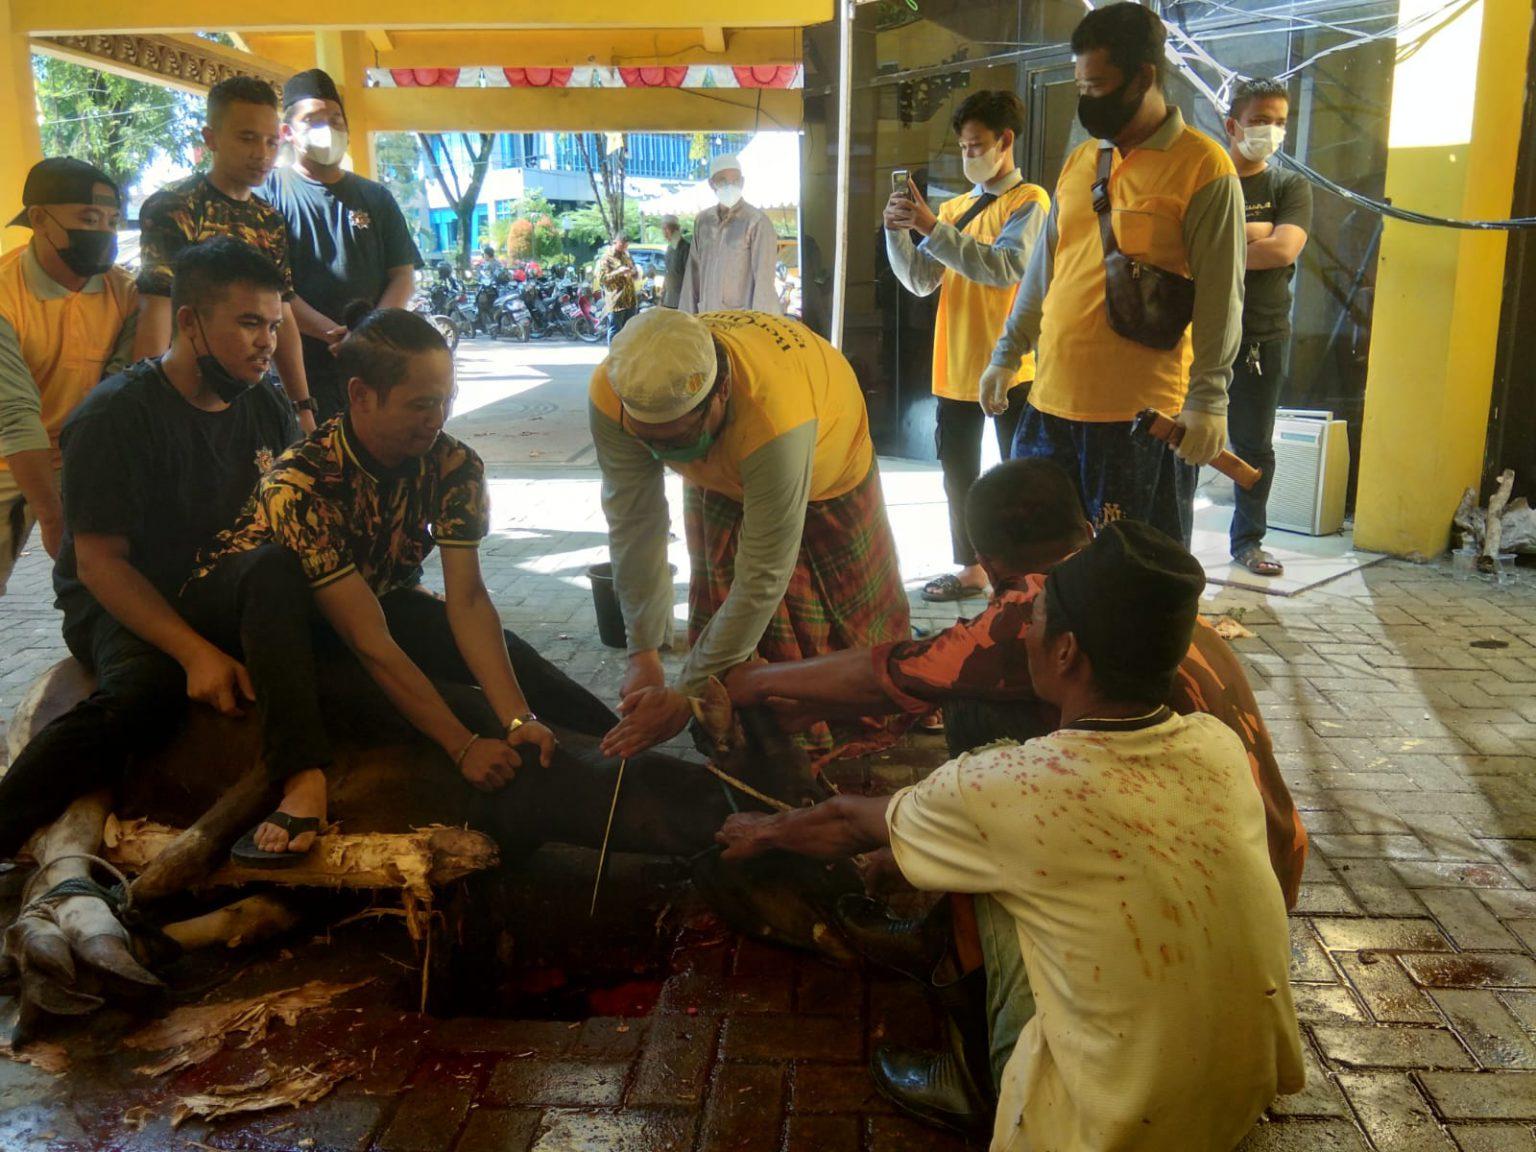 Sembelih 12 Ekor Sapi Kurban, Golkar Kalsel Bagikan Daging Untuk Masyarakat Banjarmasin